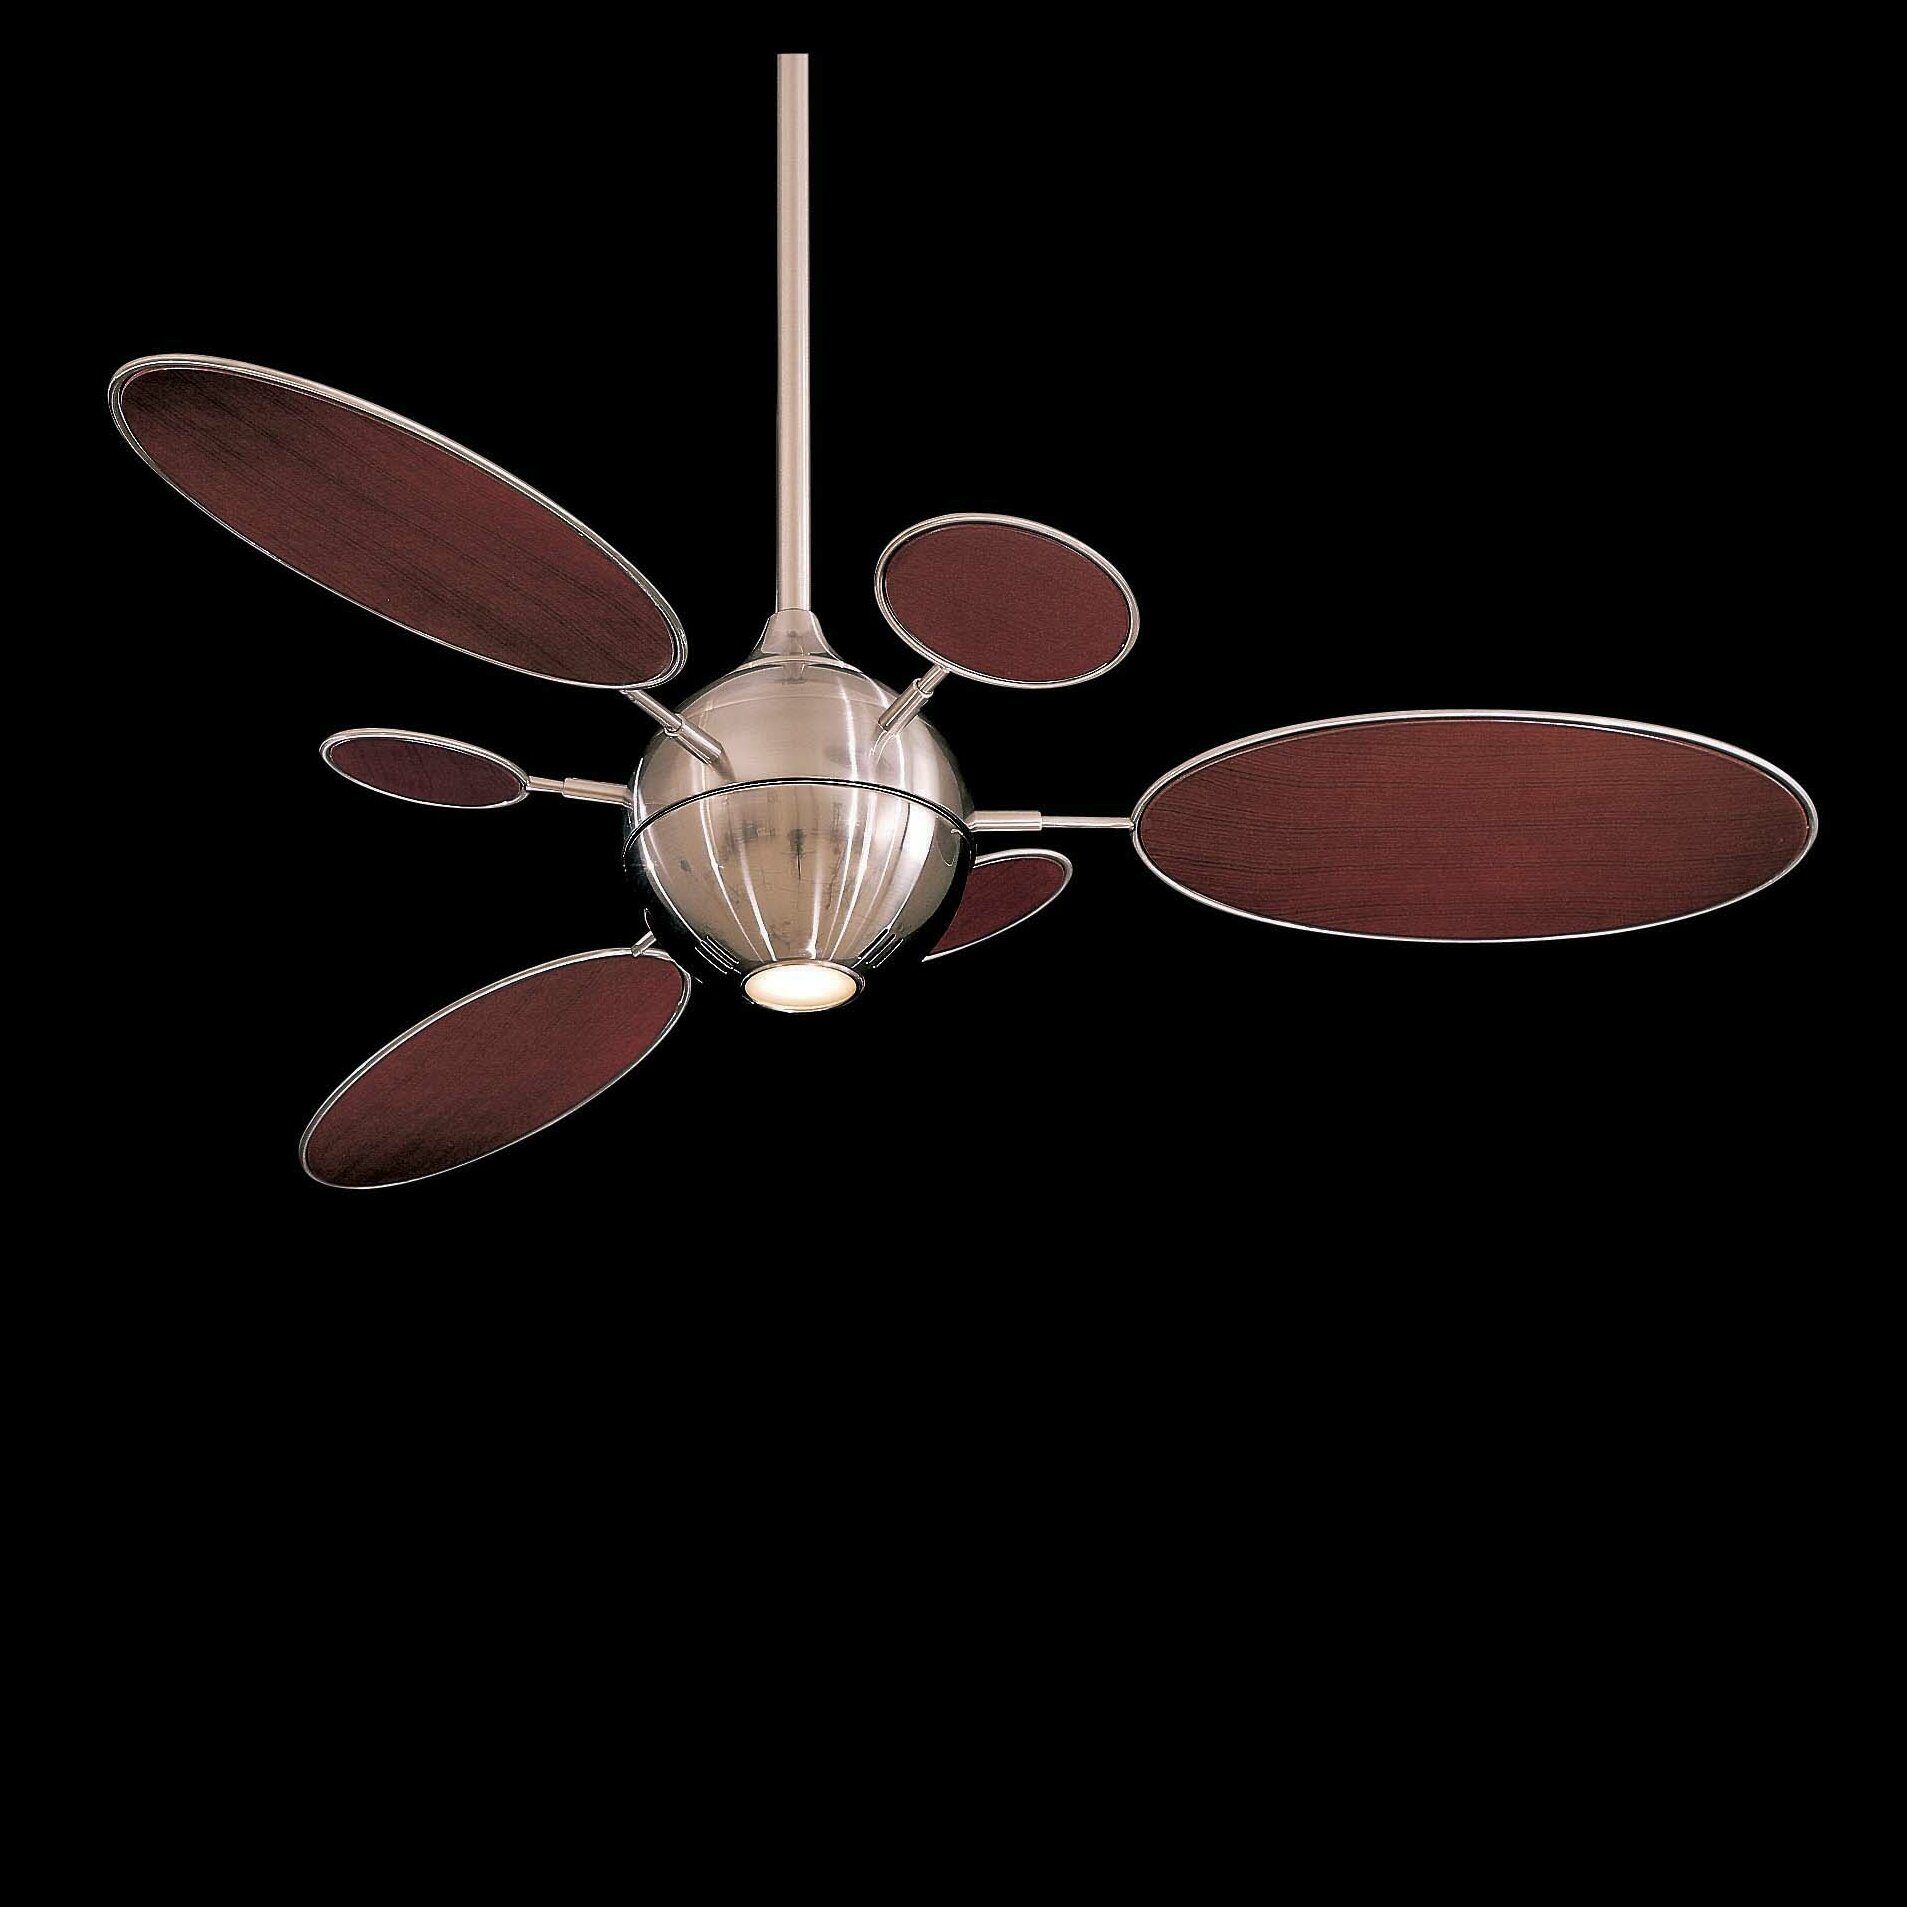 Ceiling Fan Minka Aire: Minka Aire George Kovacs Cirque Ceiling Fan Blade Set